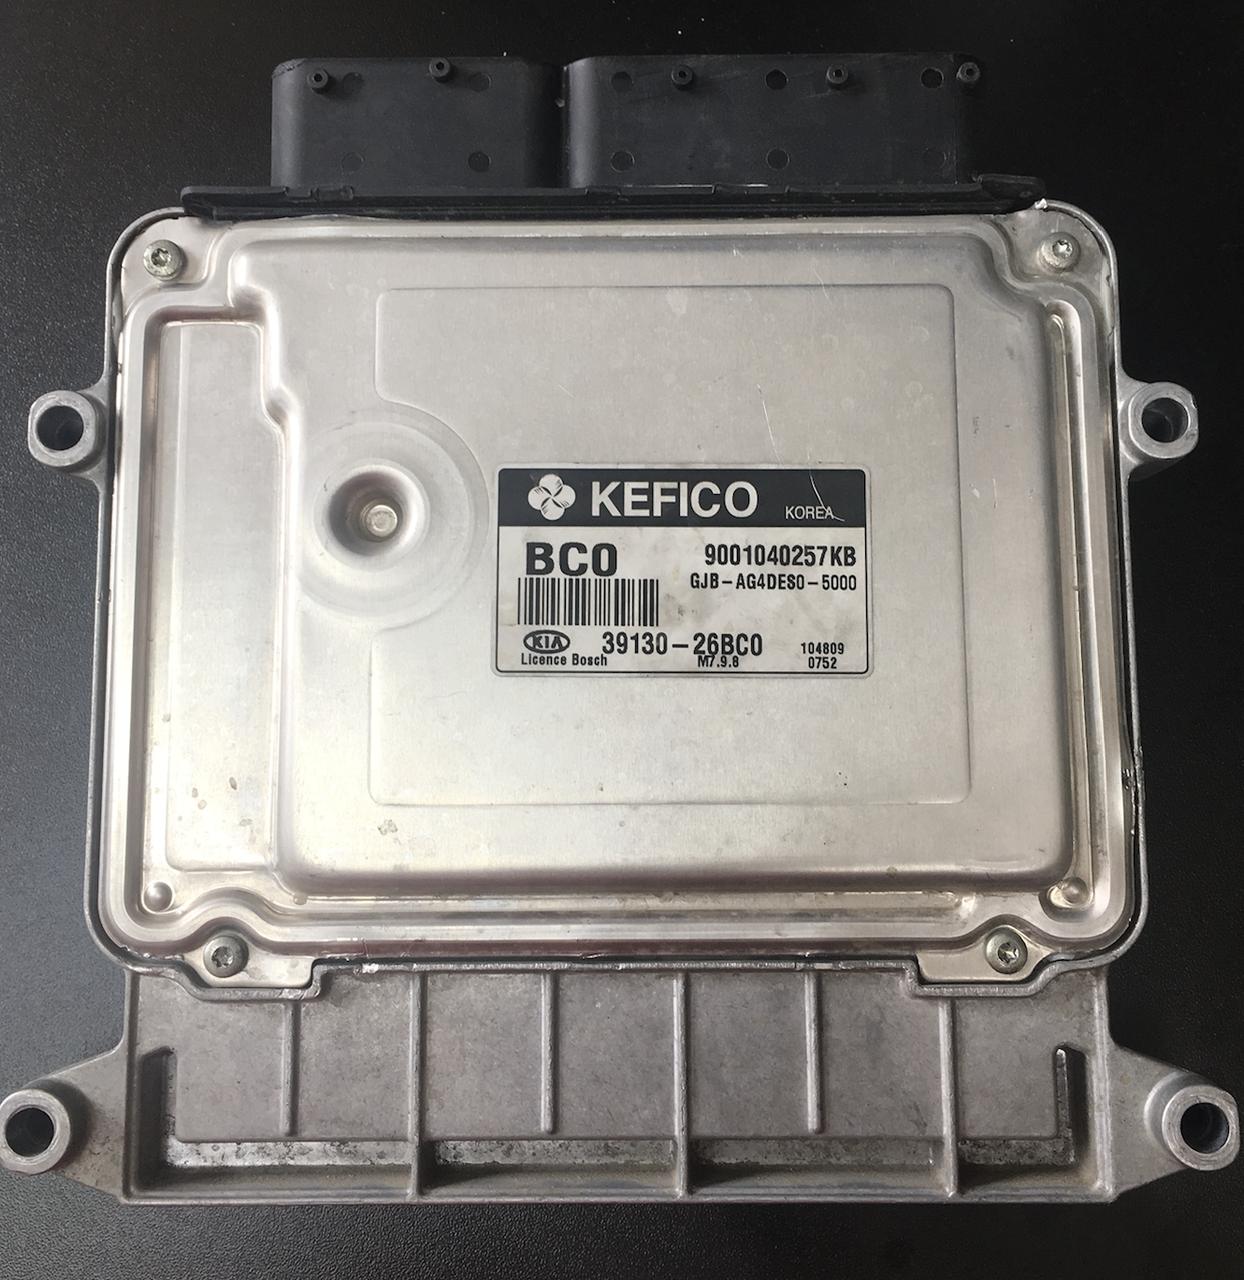 Astounding Plug Play Kefico Engine Ecu Kia 9001040257Kb 39130 26Bc0 Gjb Wiring Digital Resources Nekoutcompassionincorg